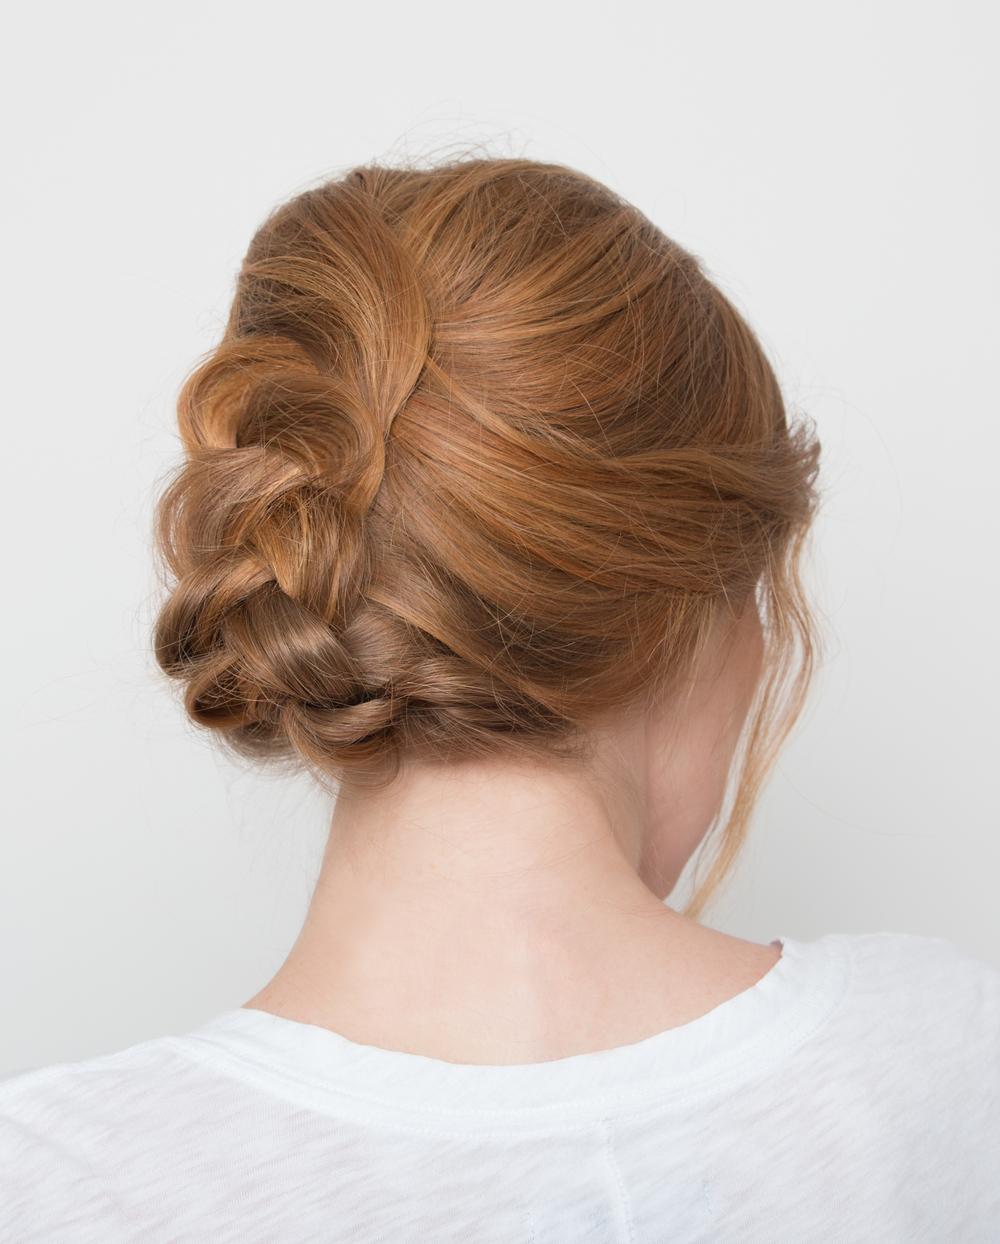 braided-back-side-angle.jpg